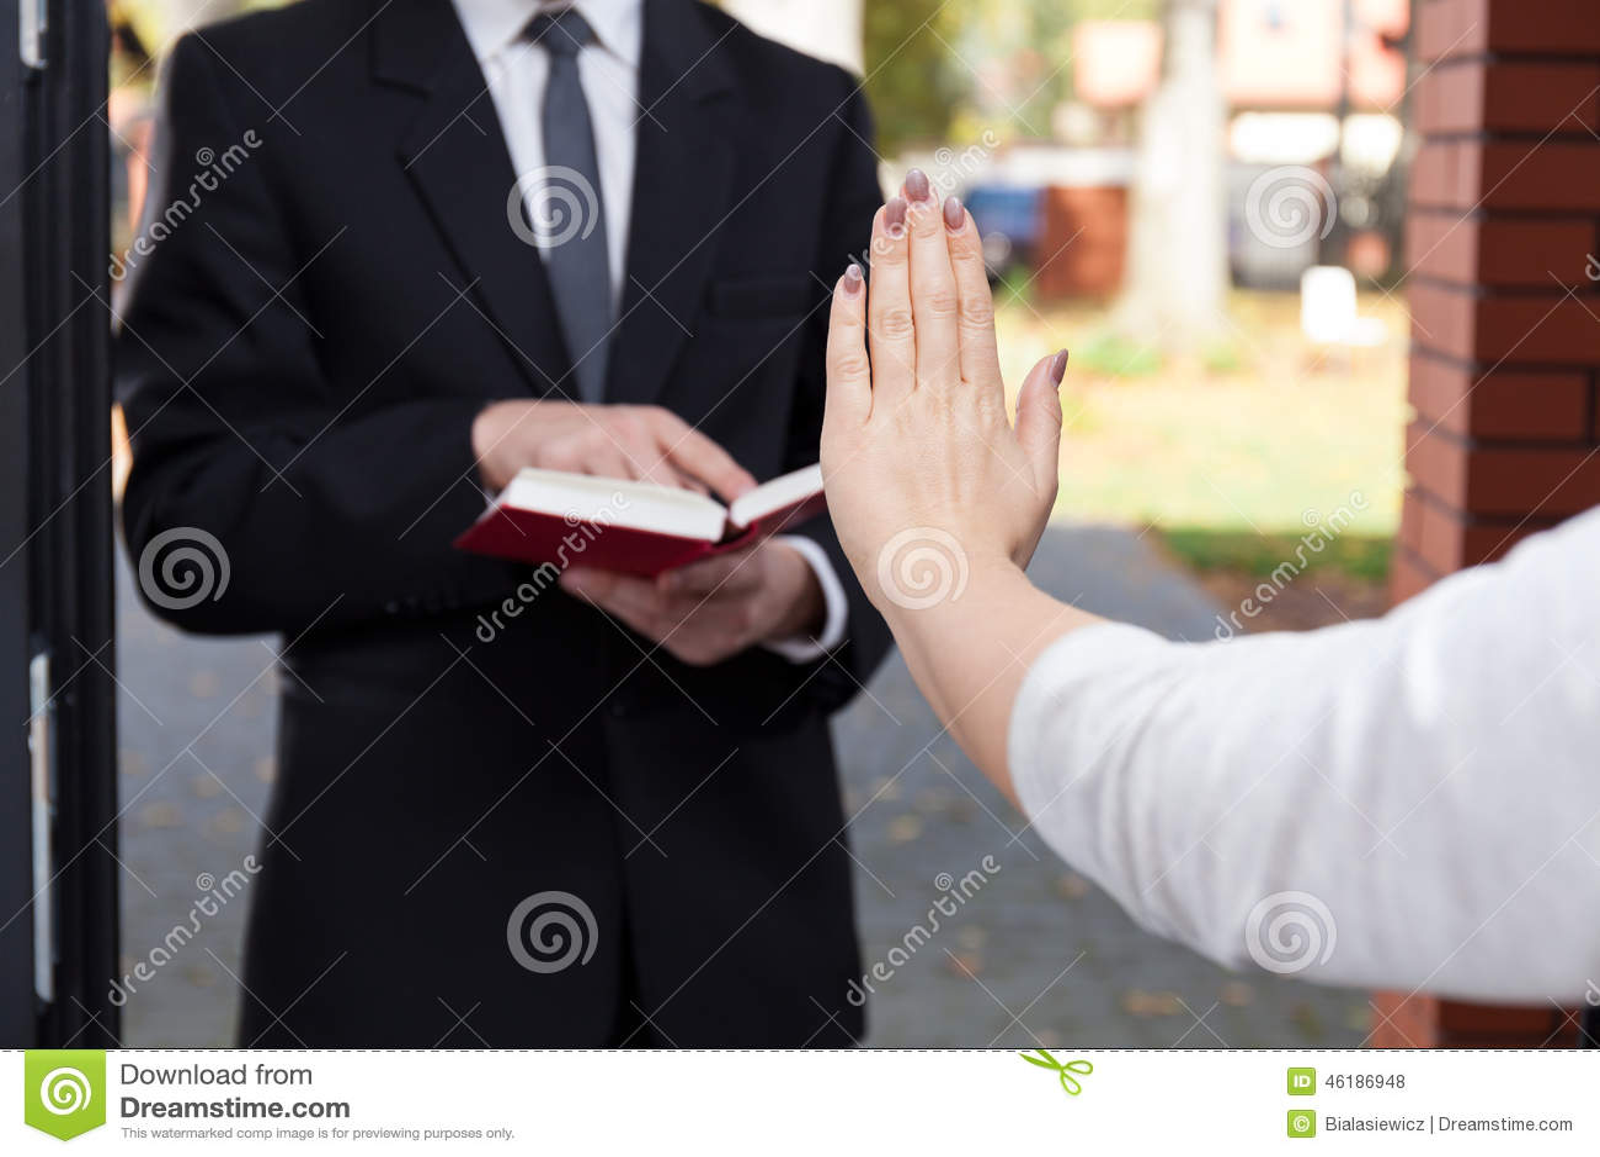 Interpretazione dei Sogni - Pagina 14 Jehovah-s-witness-wants-to-evangelize-refusing-woman-46186948